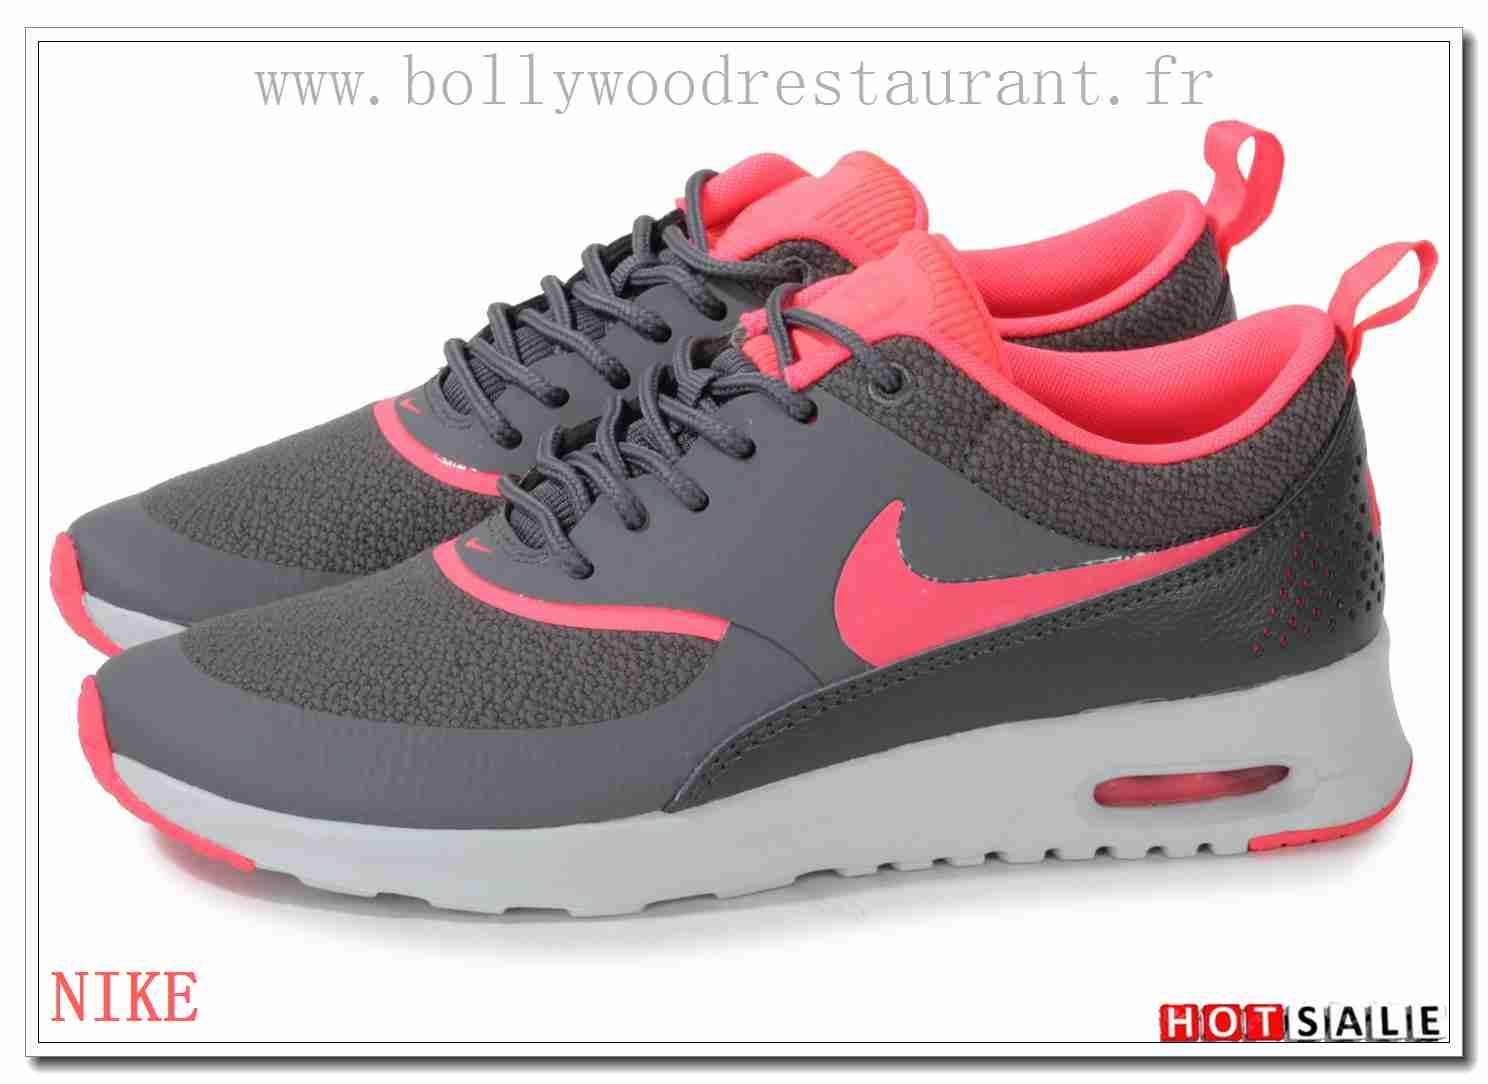 CQ6487 jeune fabuleux 2018 Nouveau style Nike Air Max Thea - Femme  Chaussures - Promotions Vente - H.K.Y.&642 - Taille : 36~39